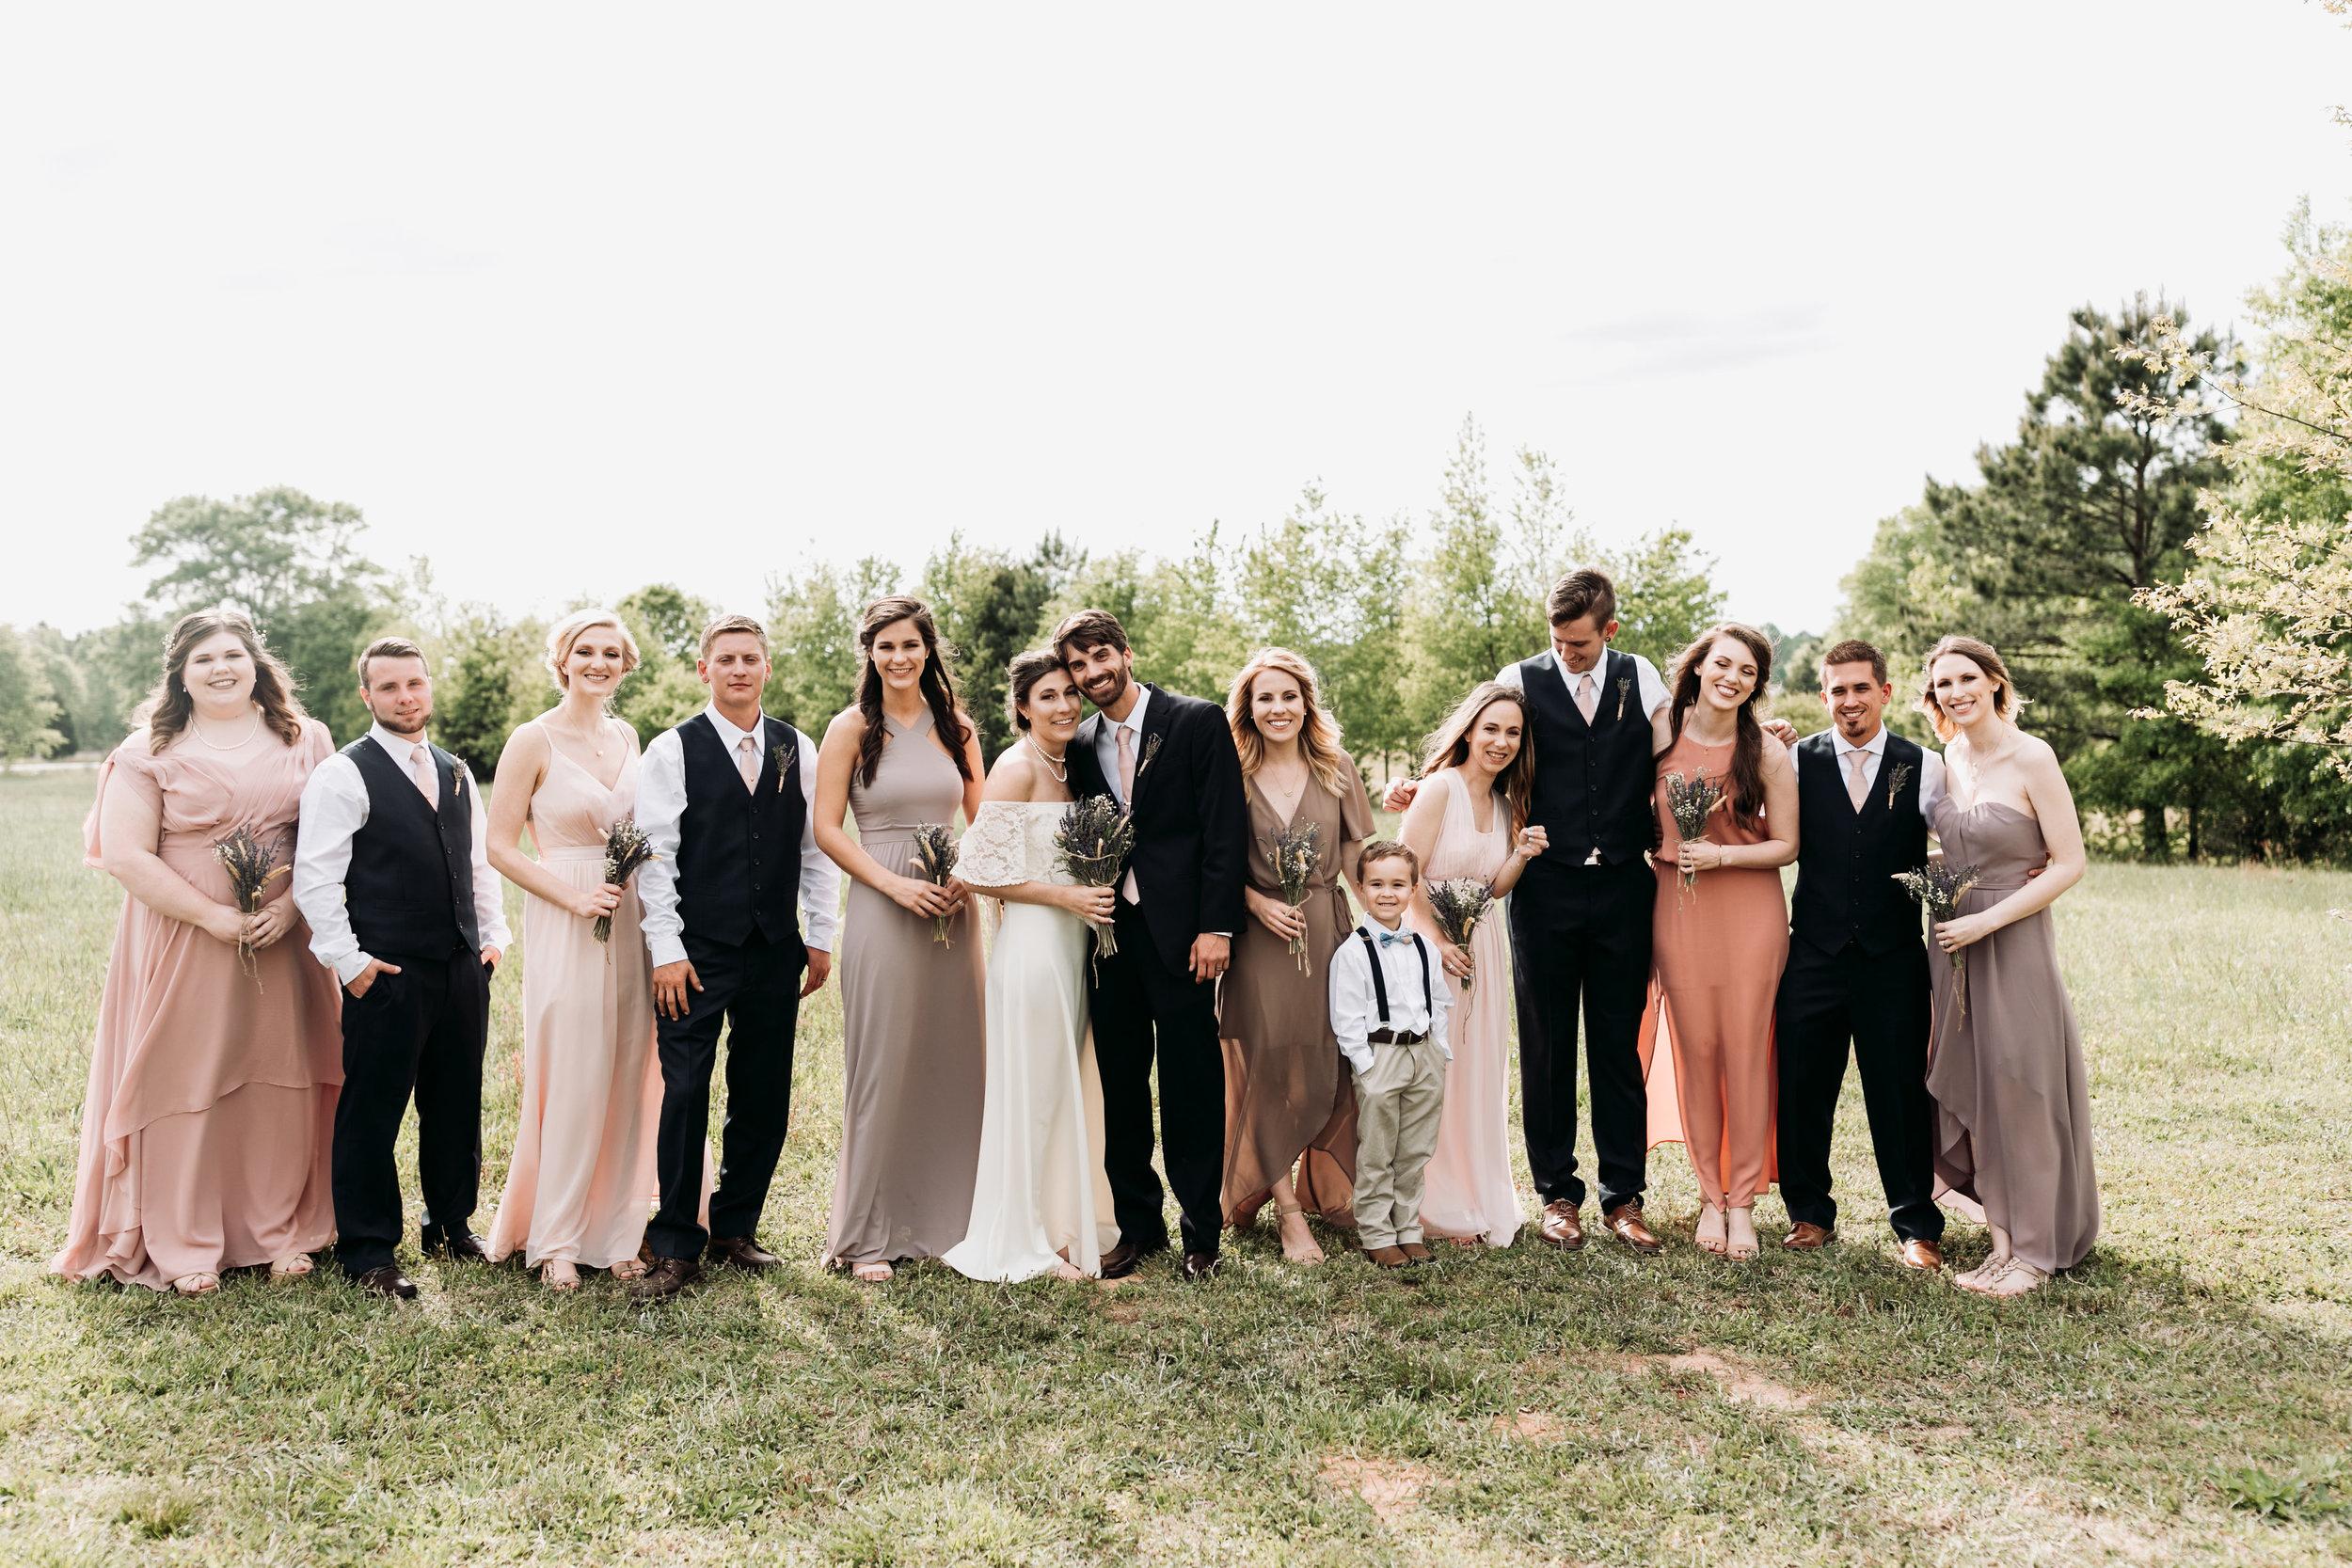 April wedding, photo by Sydney Renee Photography